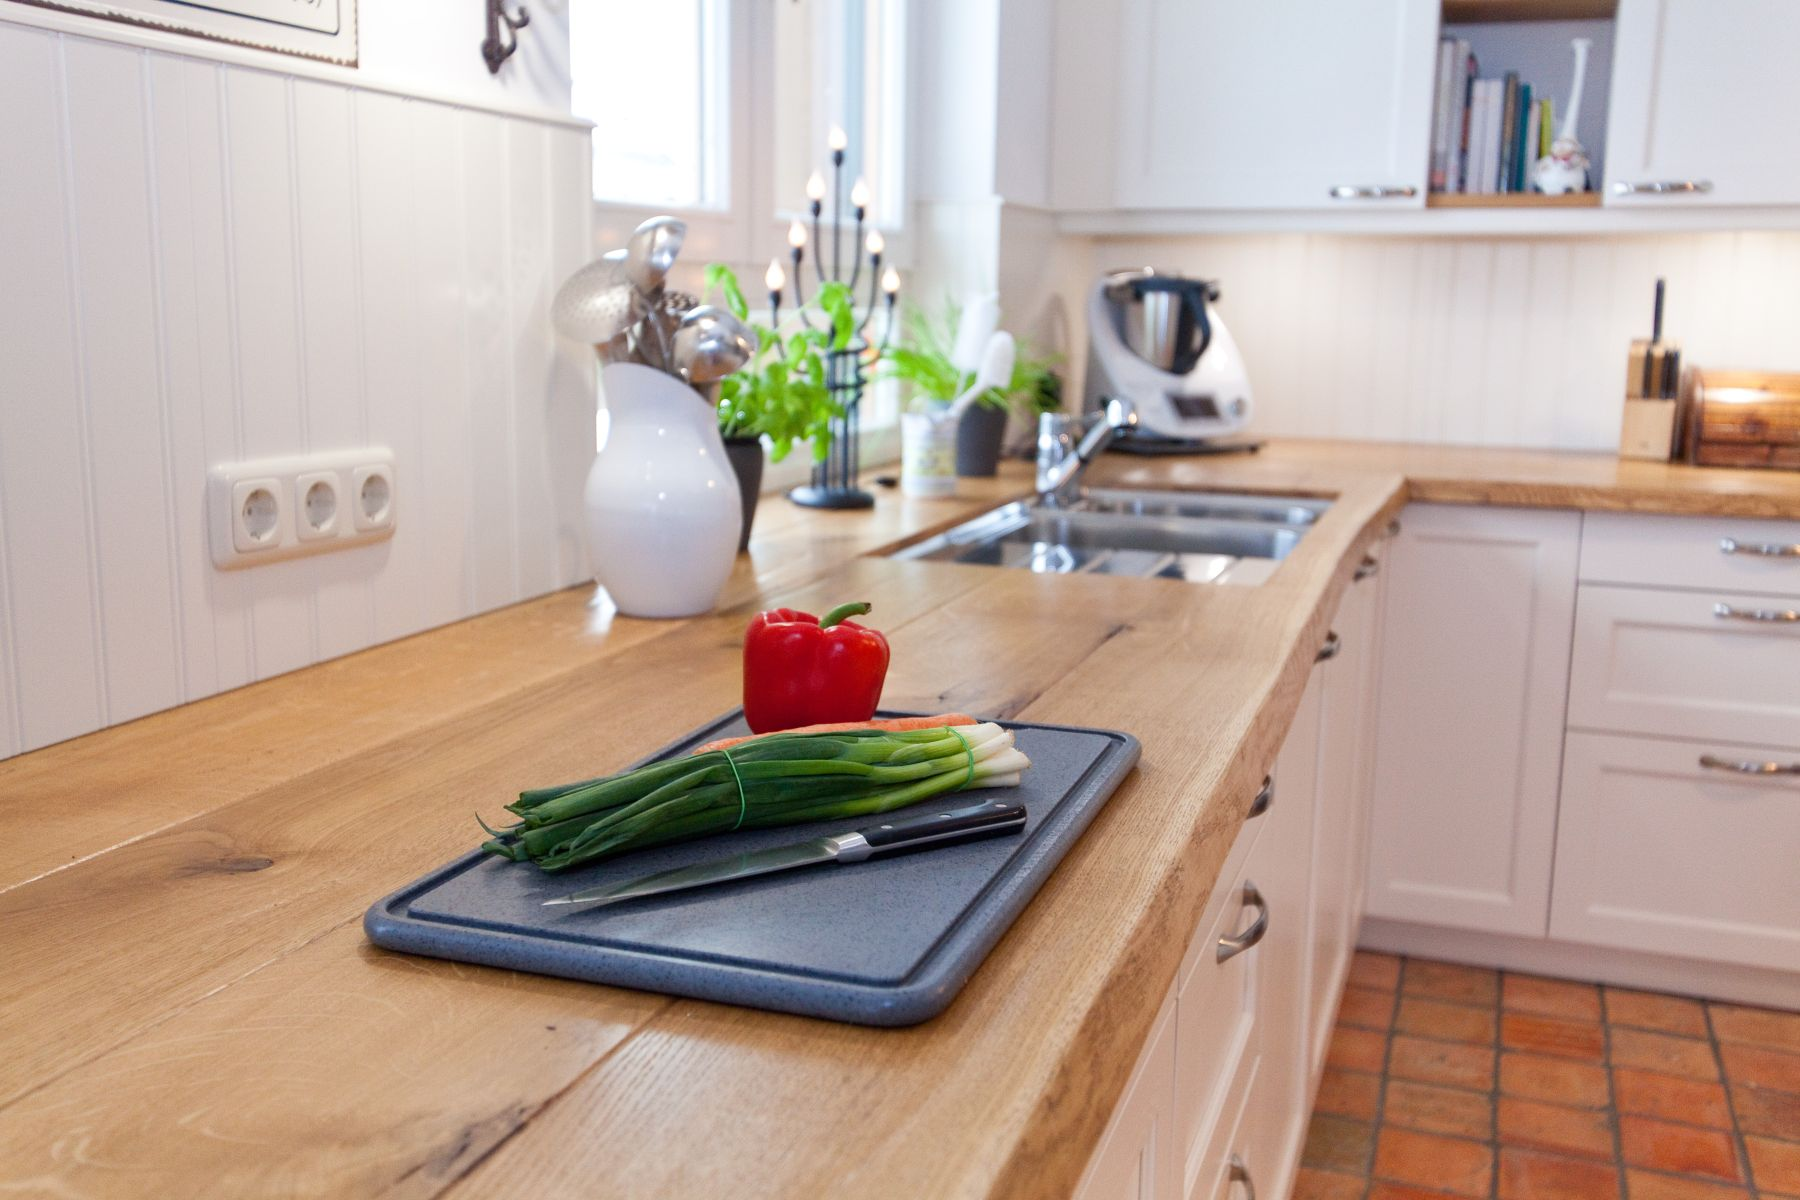 Massivholz- & Echtholz-Arbeitsplatten in der Küche - Küchenhaus ... | {Küchenarbeitsplatte massivholz 13}